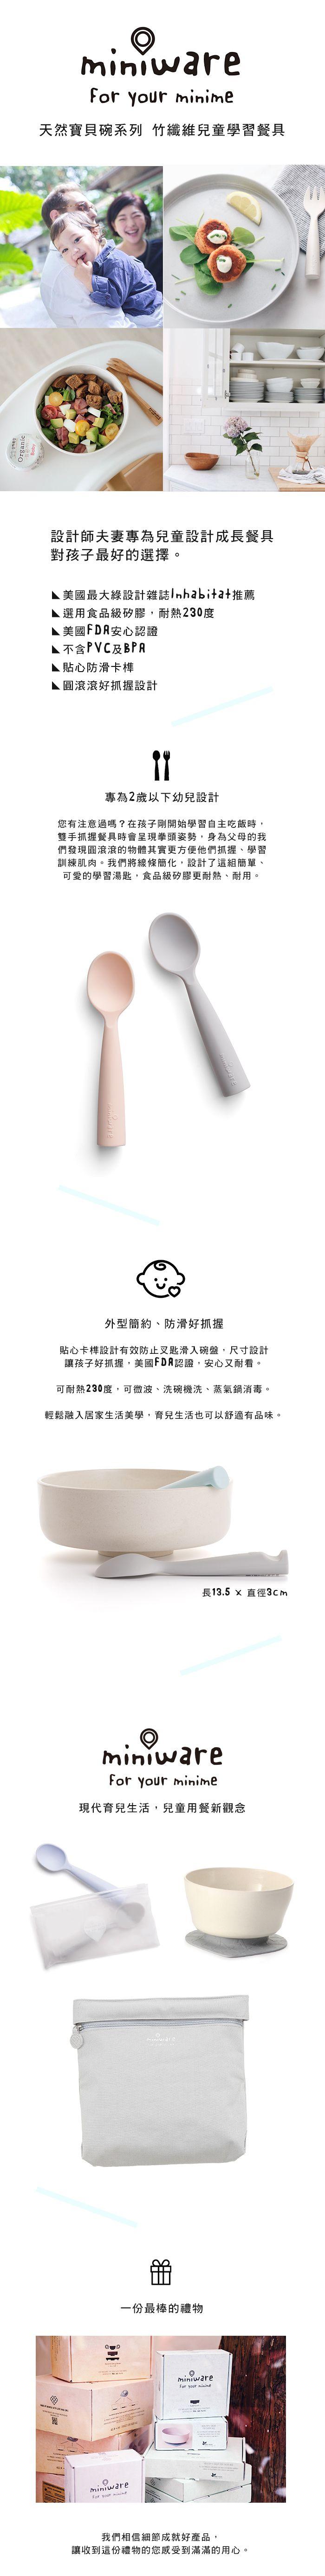 Miniware 寶貝矽膠固齒湯匙組 (芝麻/薄荷)